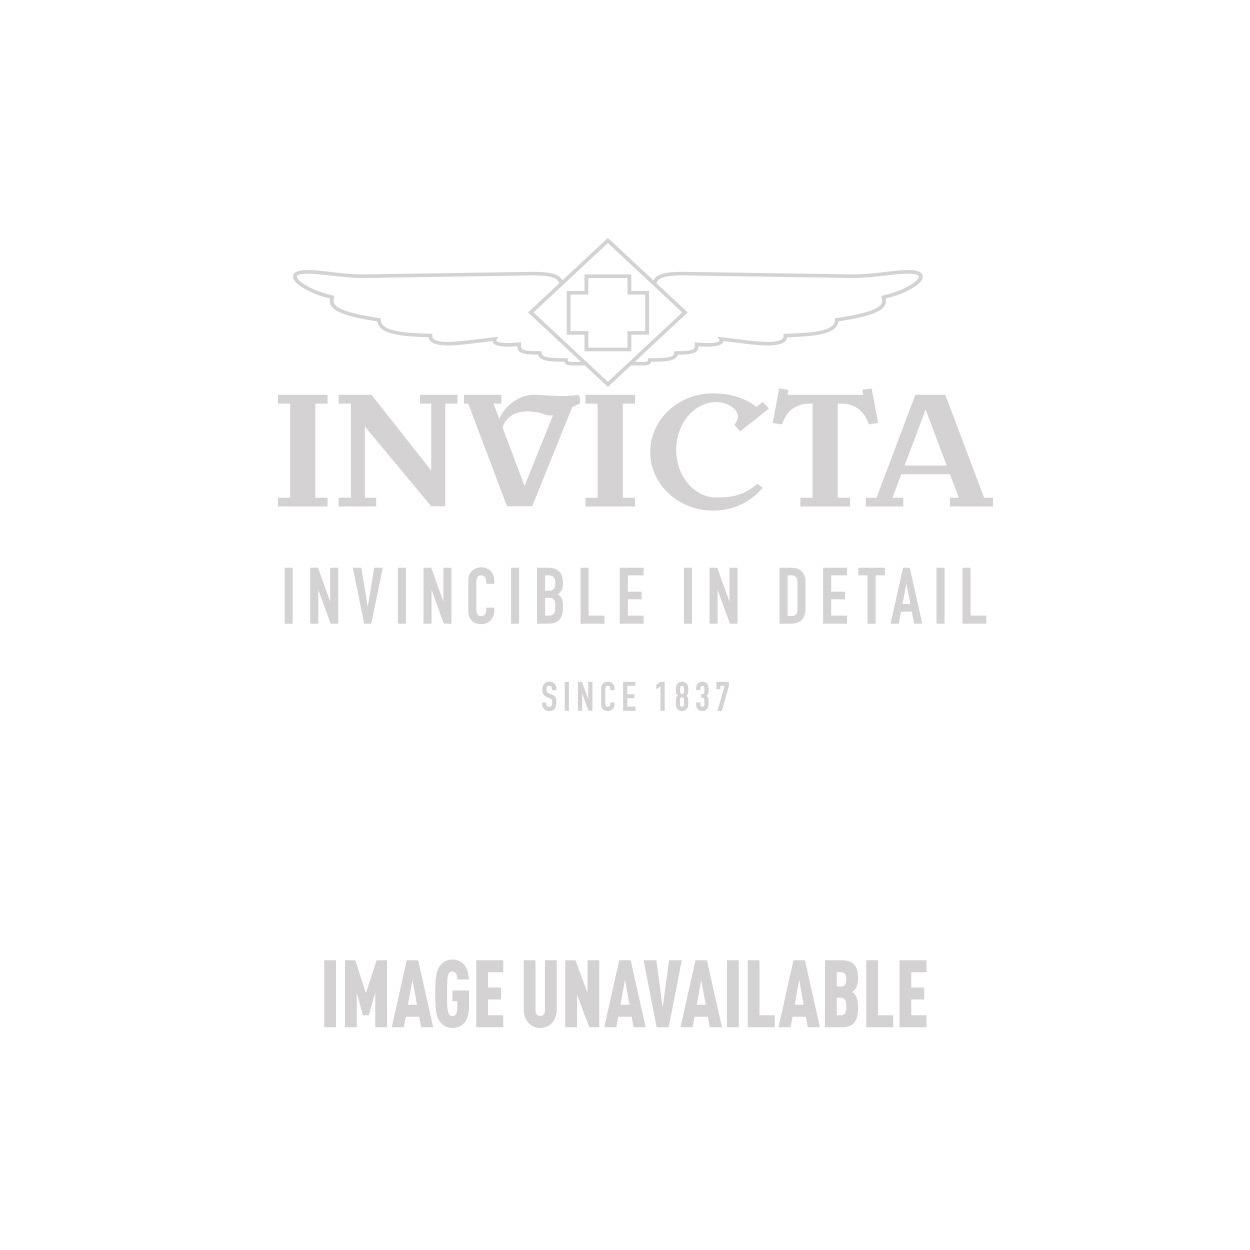 Invicta Sea Spider Swiss Movement Quartz Watch - Gunmetal case with Black, Gunmetal tone Stainless Steel, Polyurethane band - Model 80053